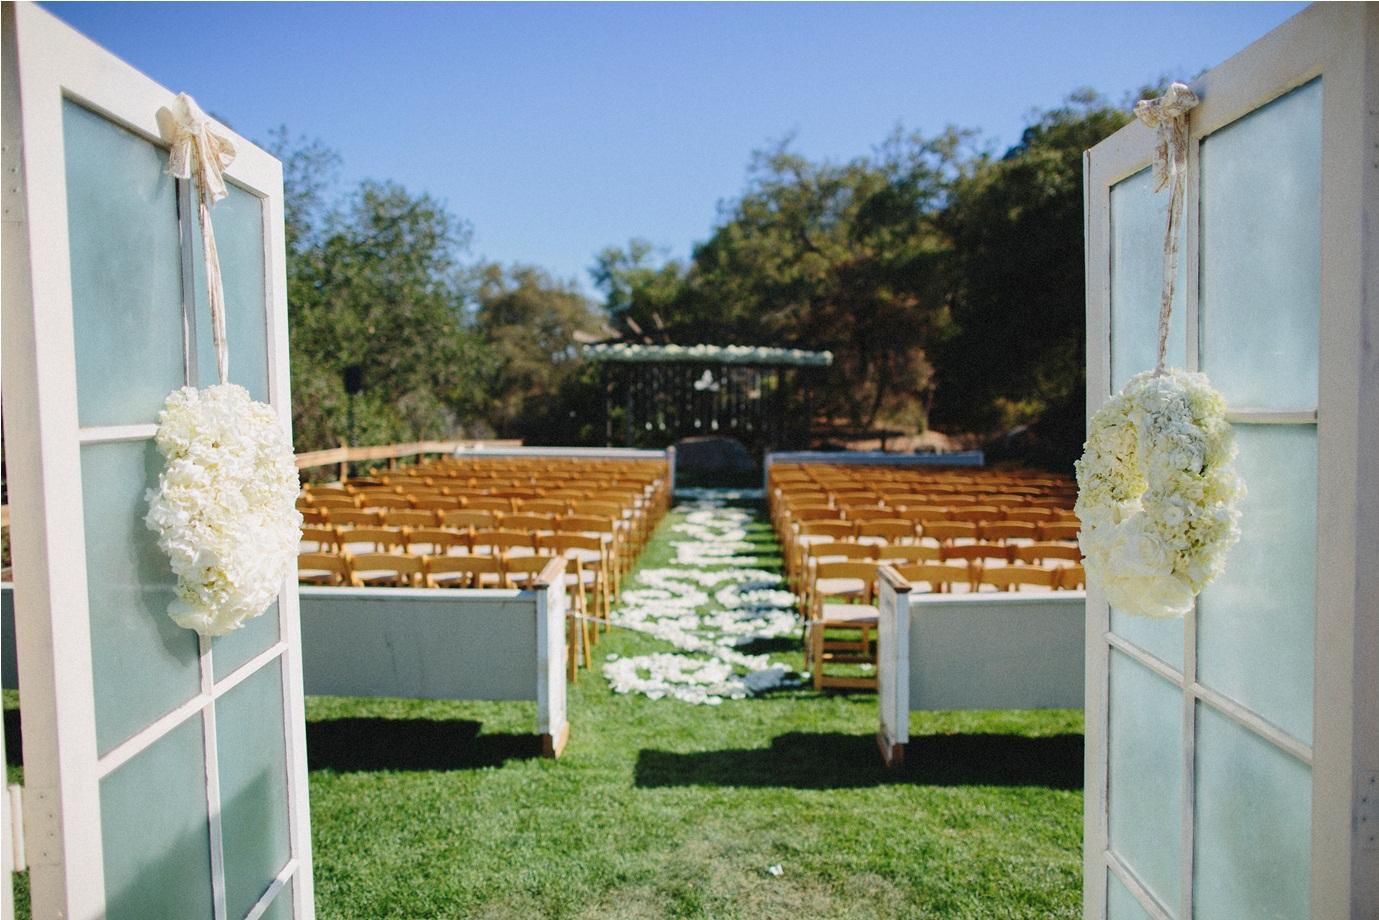 A Pretty Rustic Ranch Wedding with a Splash of Glamour